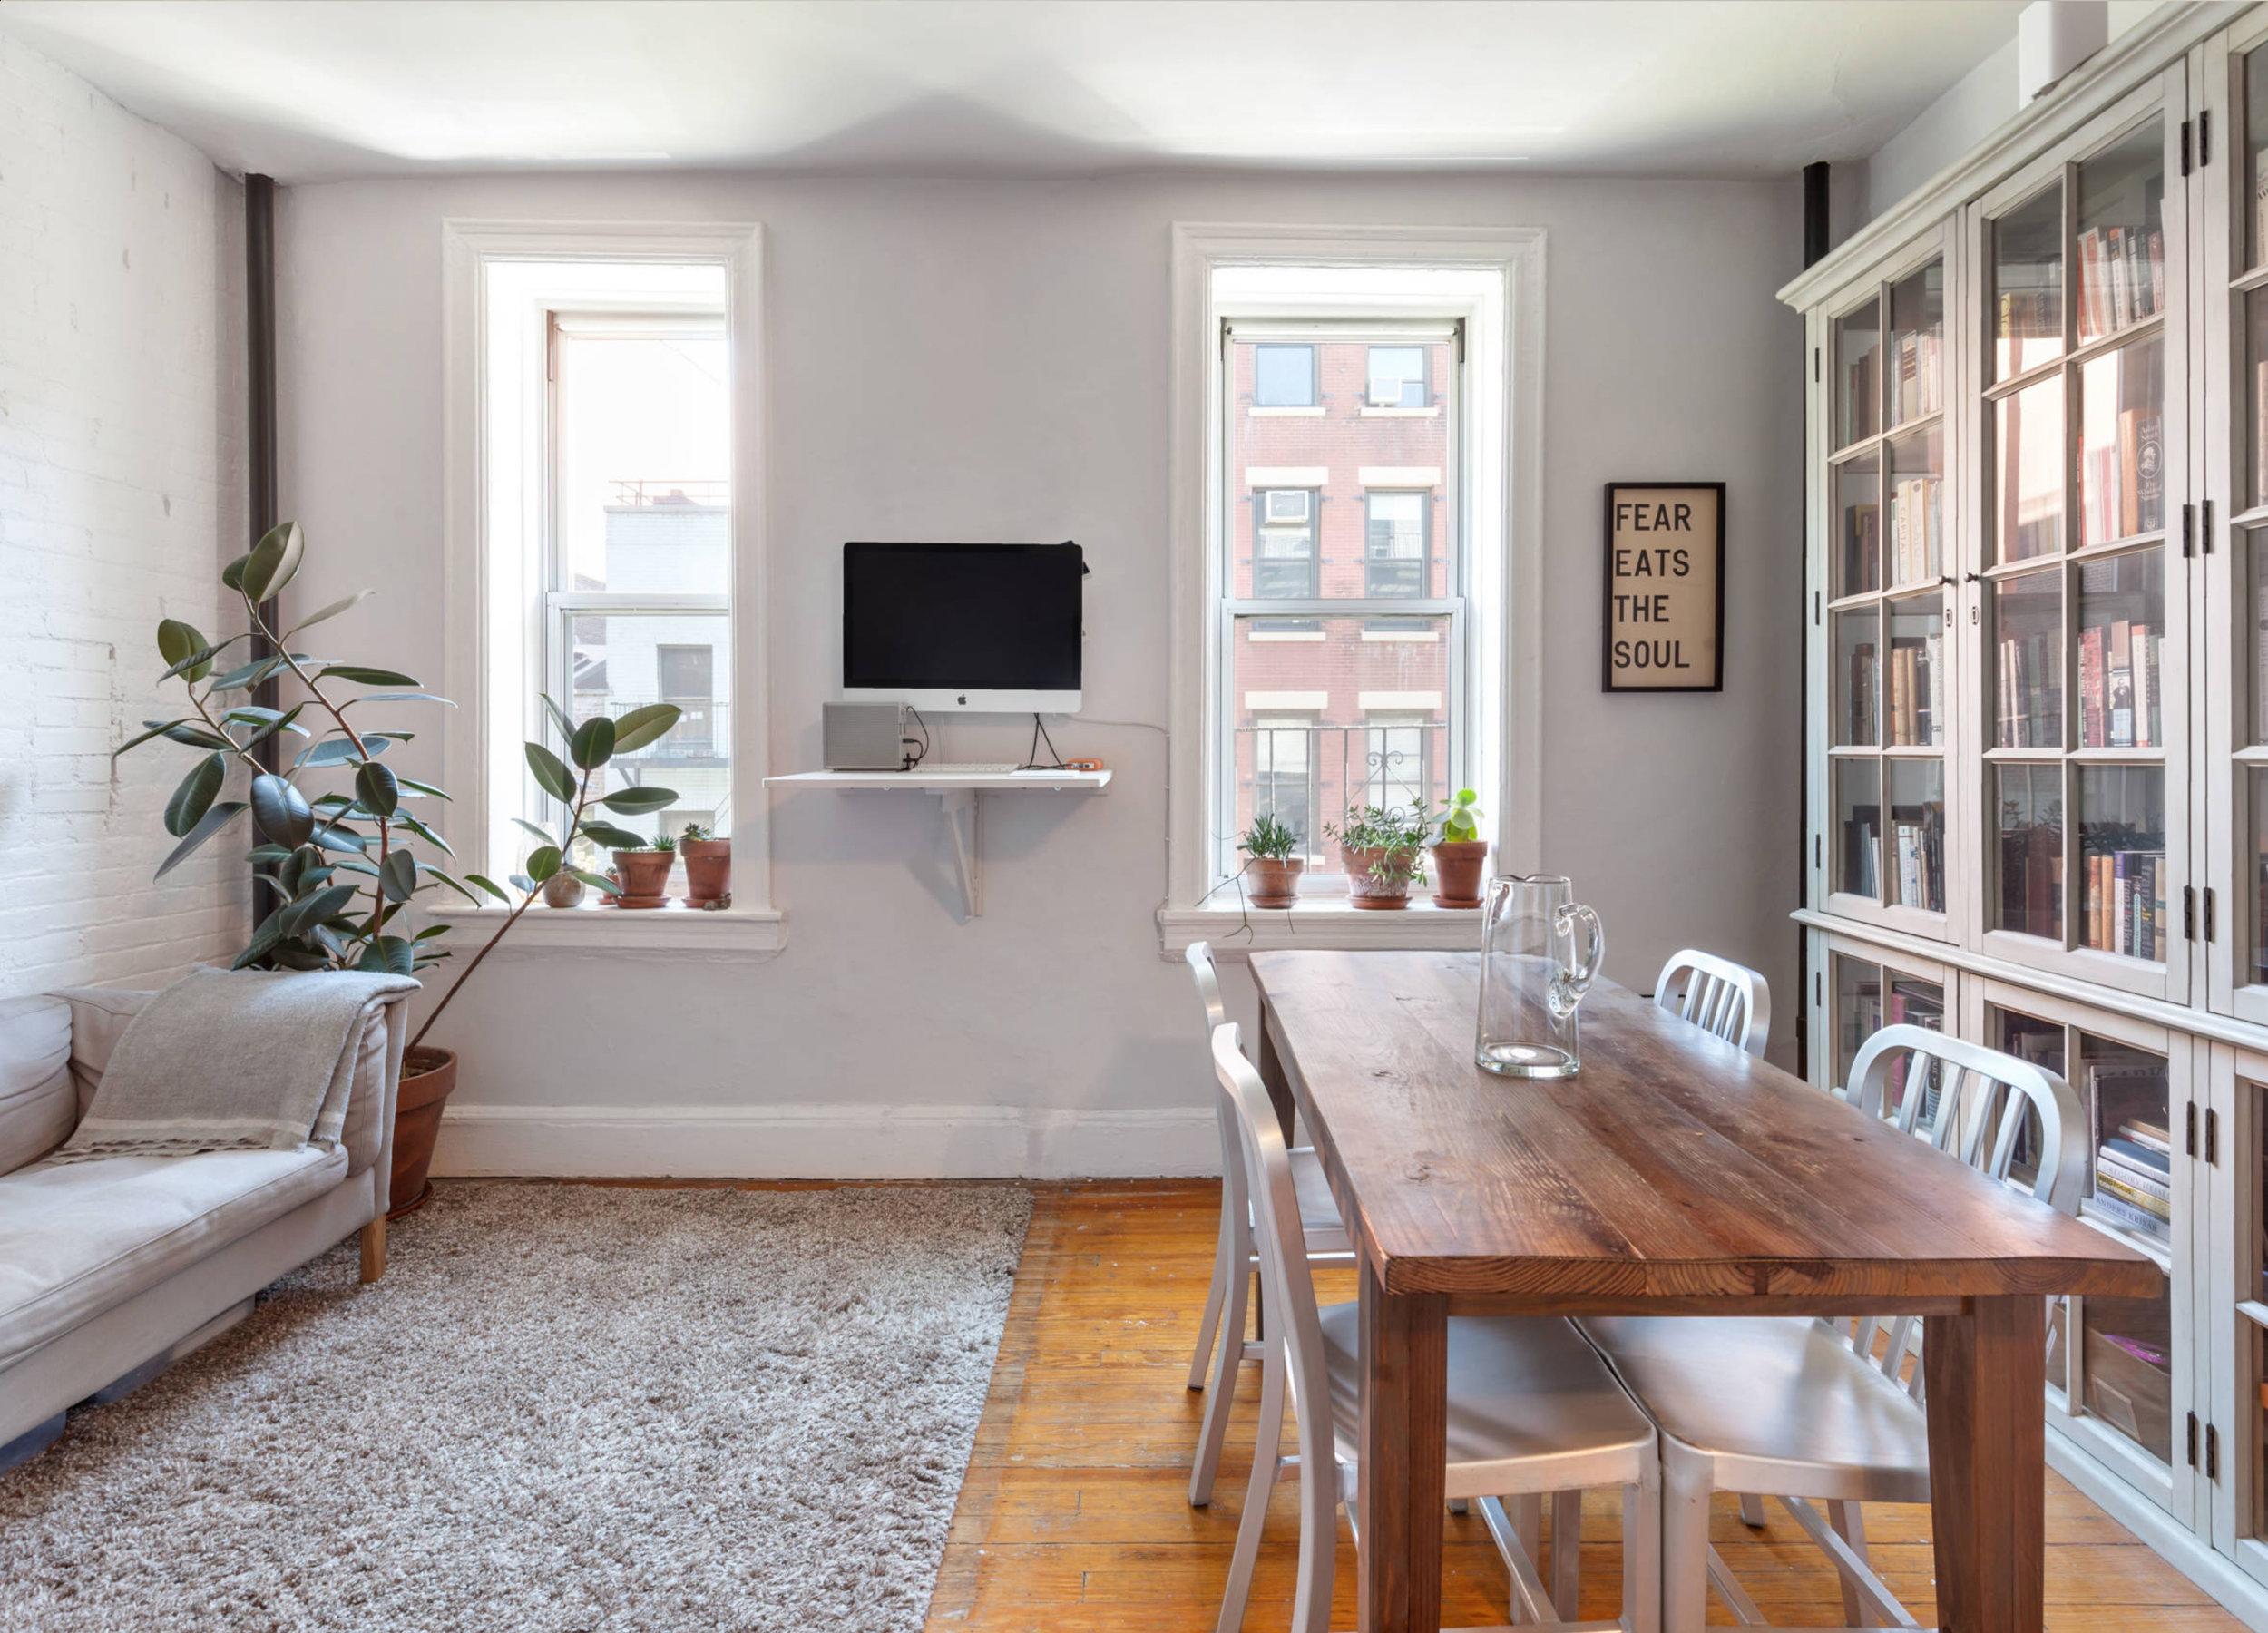 101 Thompson St, Unit 25   SoHo, Manhattan   $585,000  1 Bed | 1 Bath